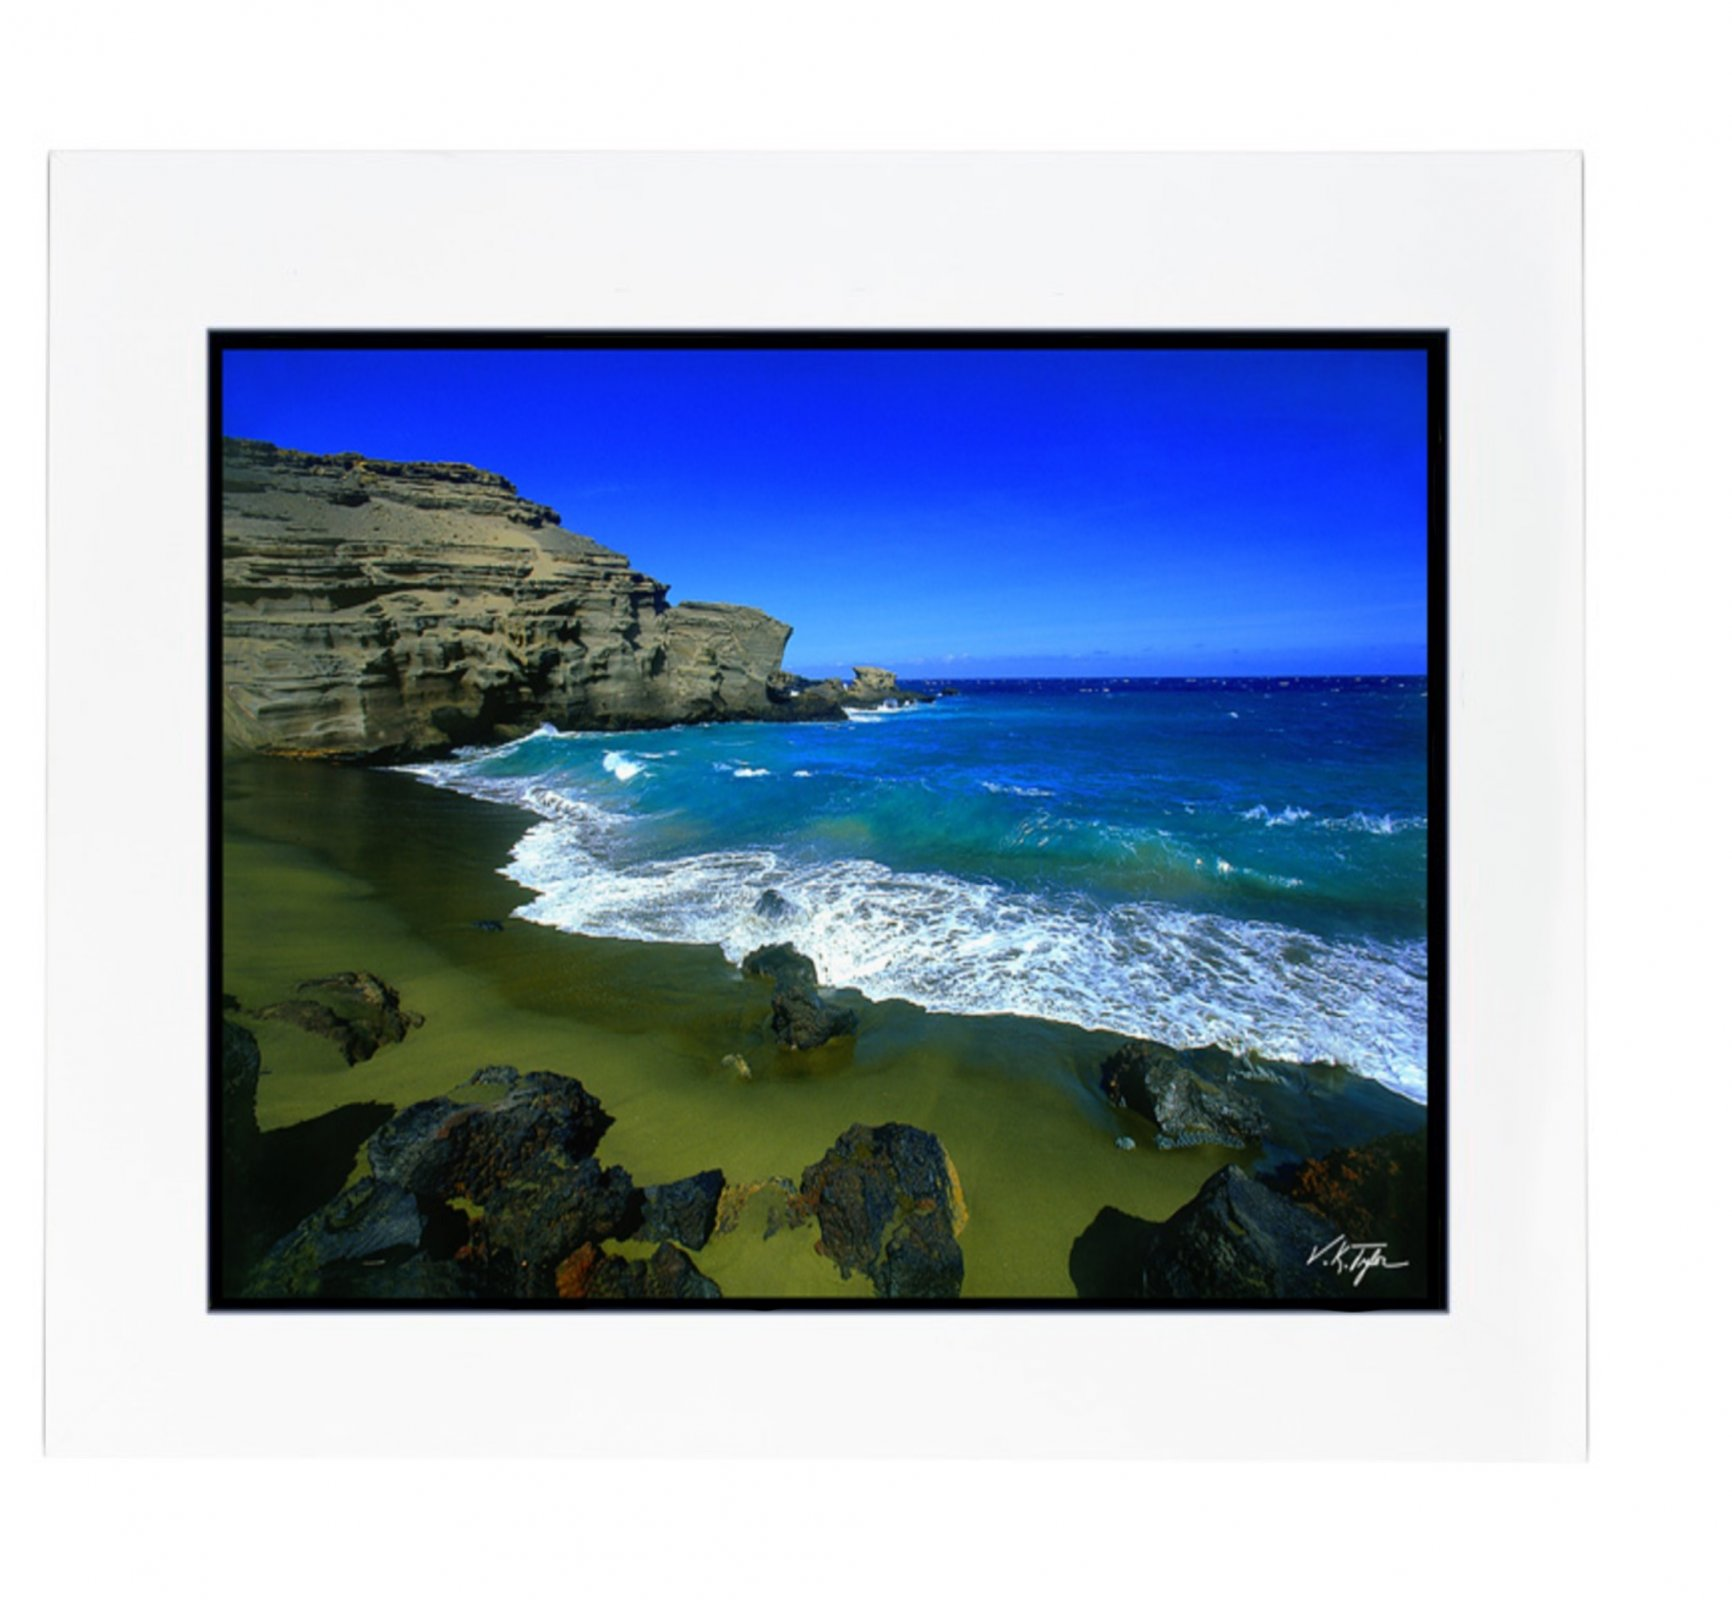 Photo > Green sand beach <p>(known as Papakōlea)